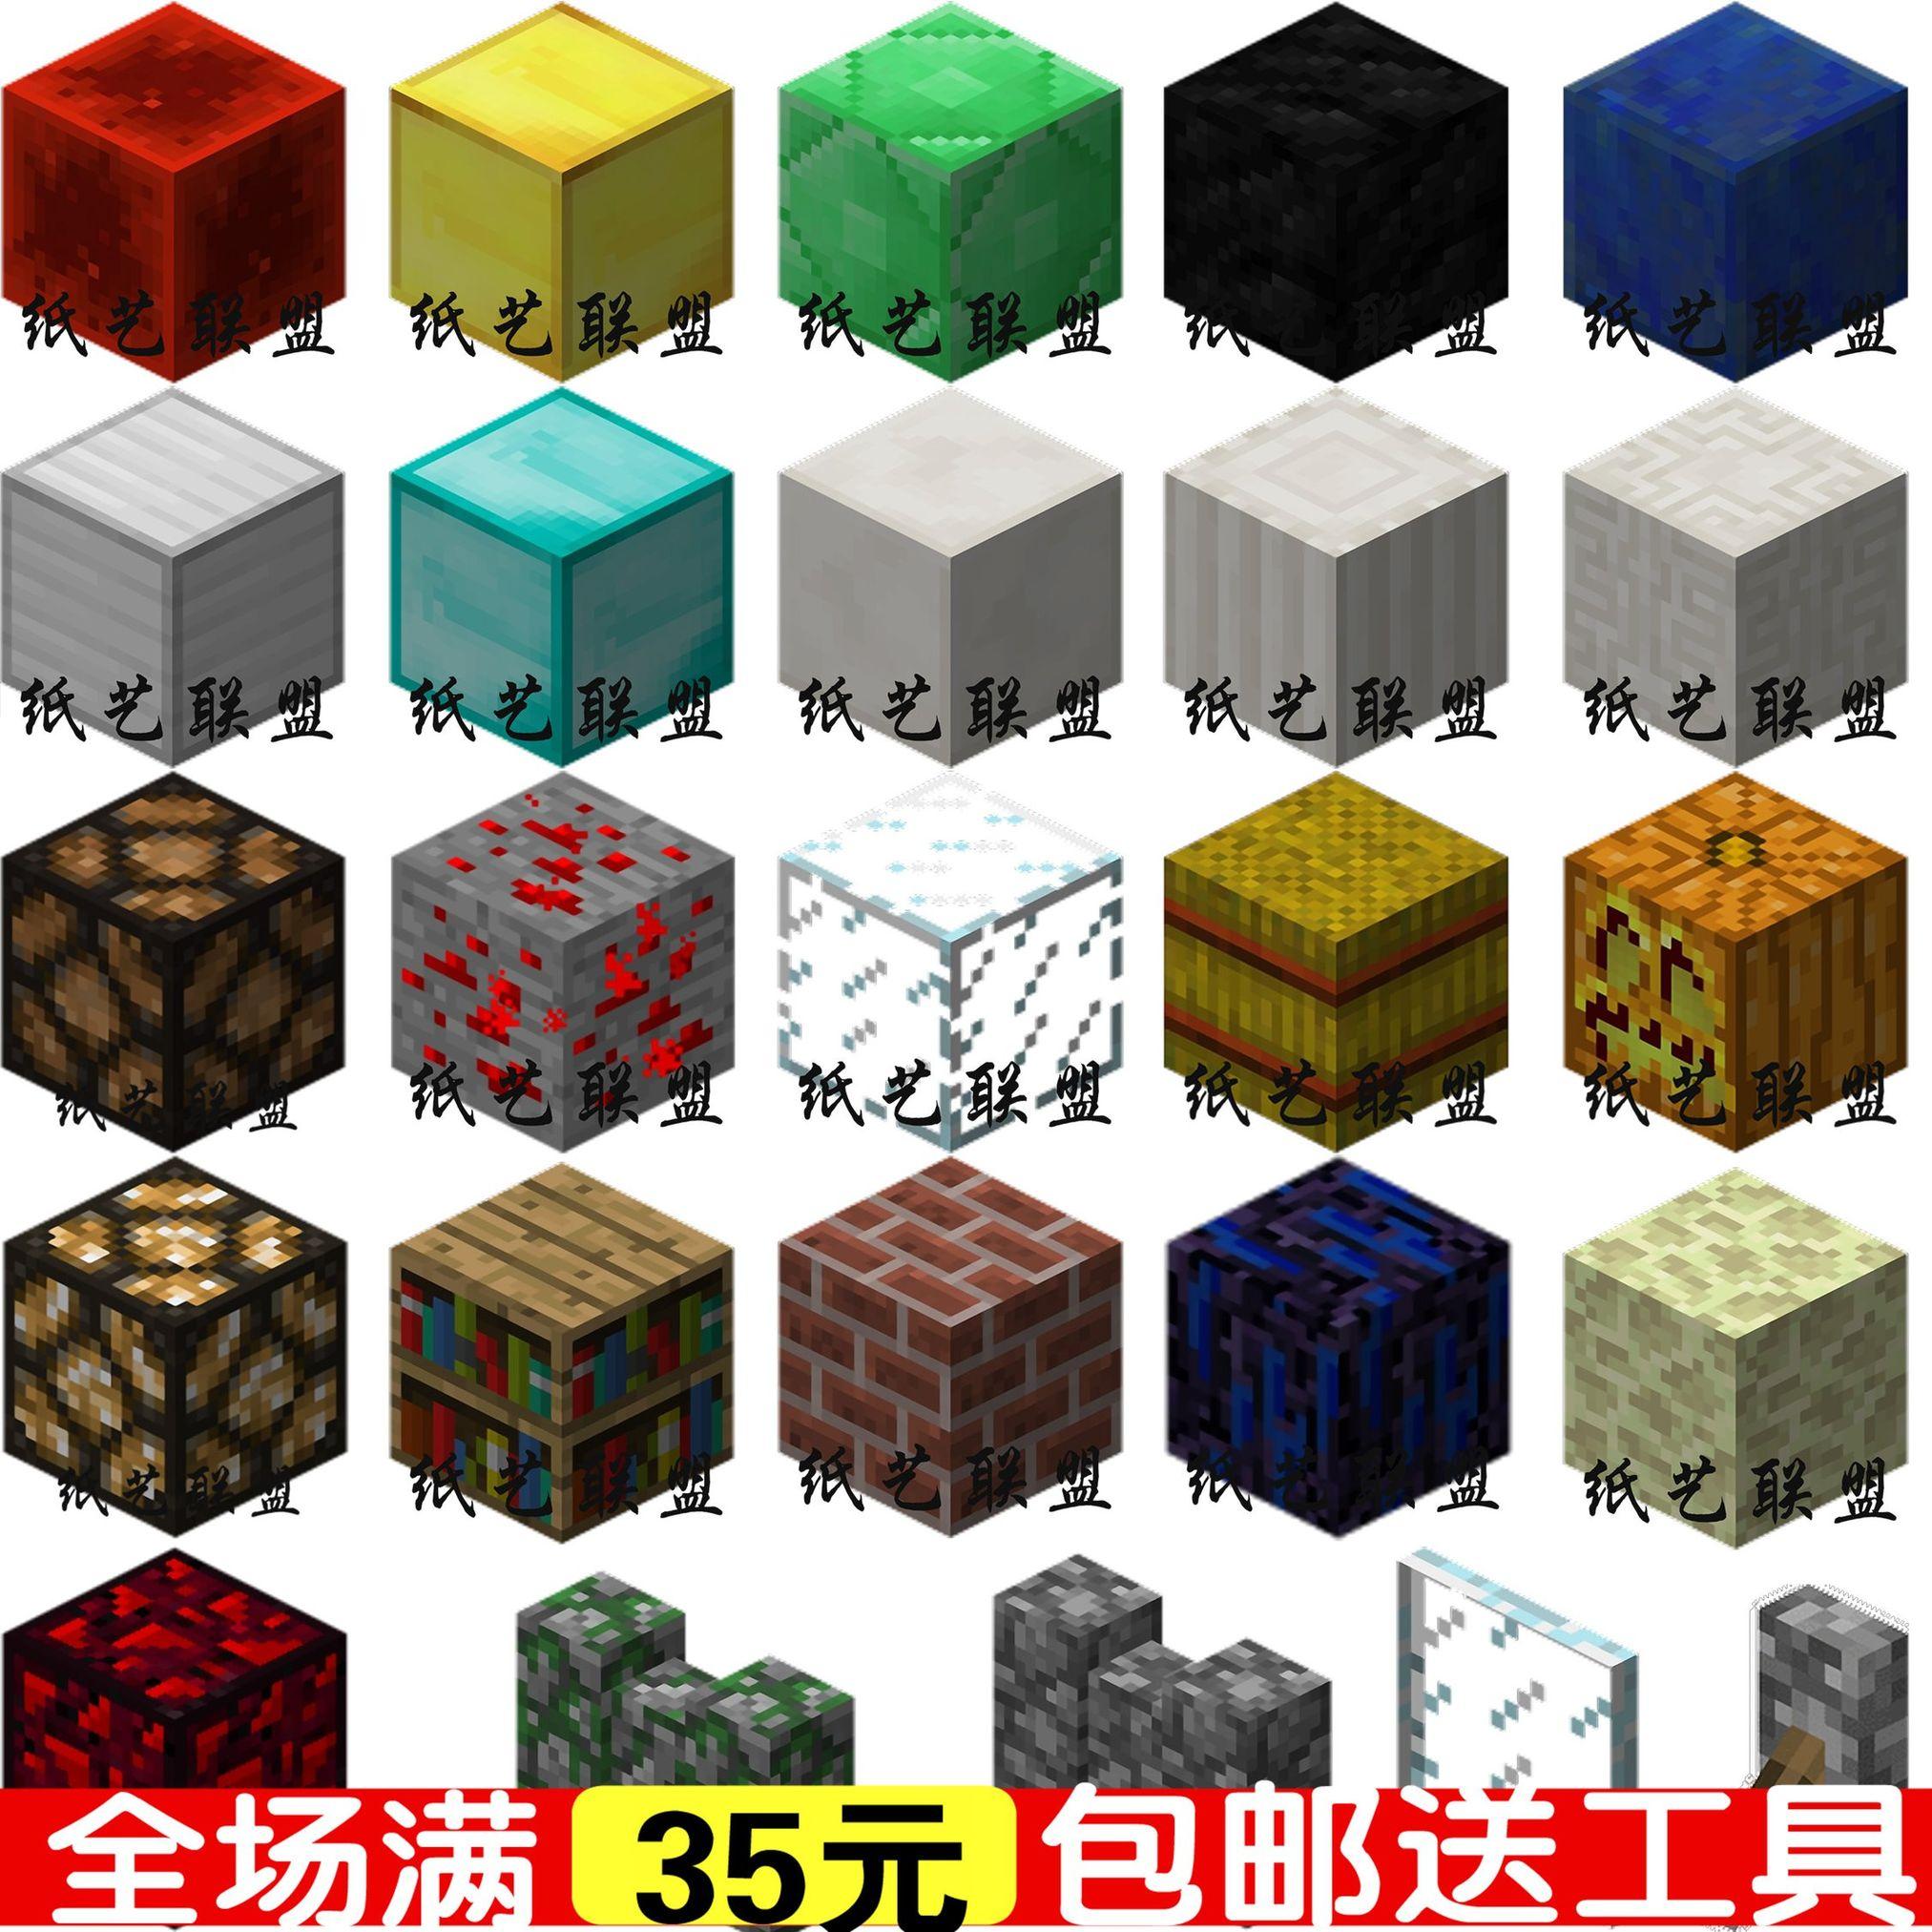 Minecraft我的世界周边玩具纸模型方块大全手工制作 6*6*6厘米 ②